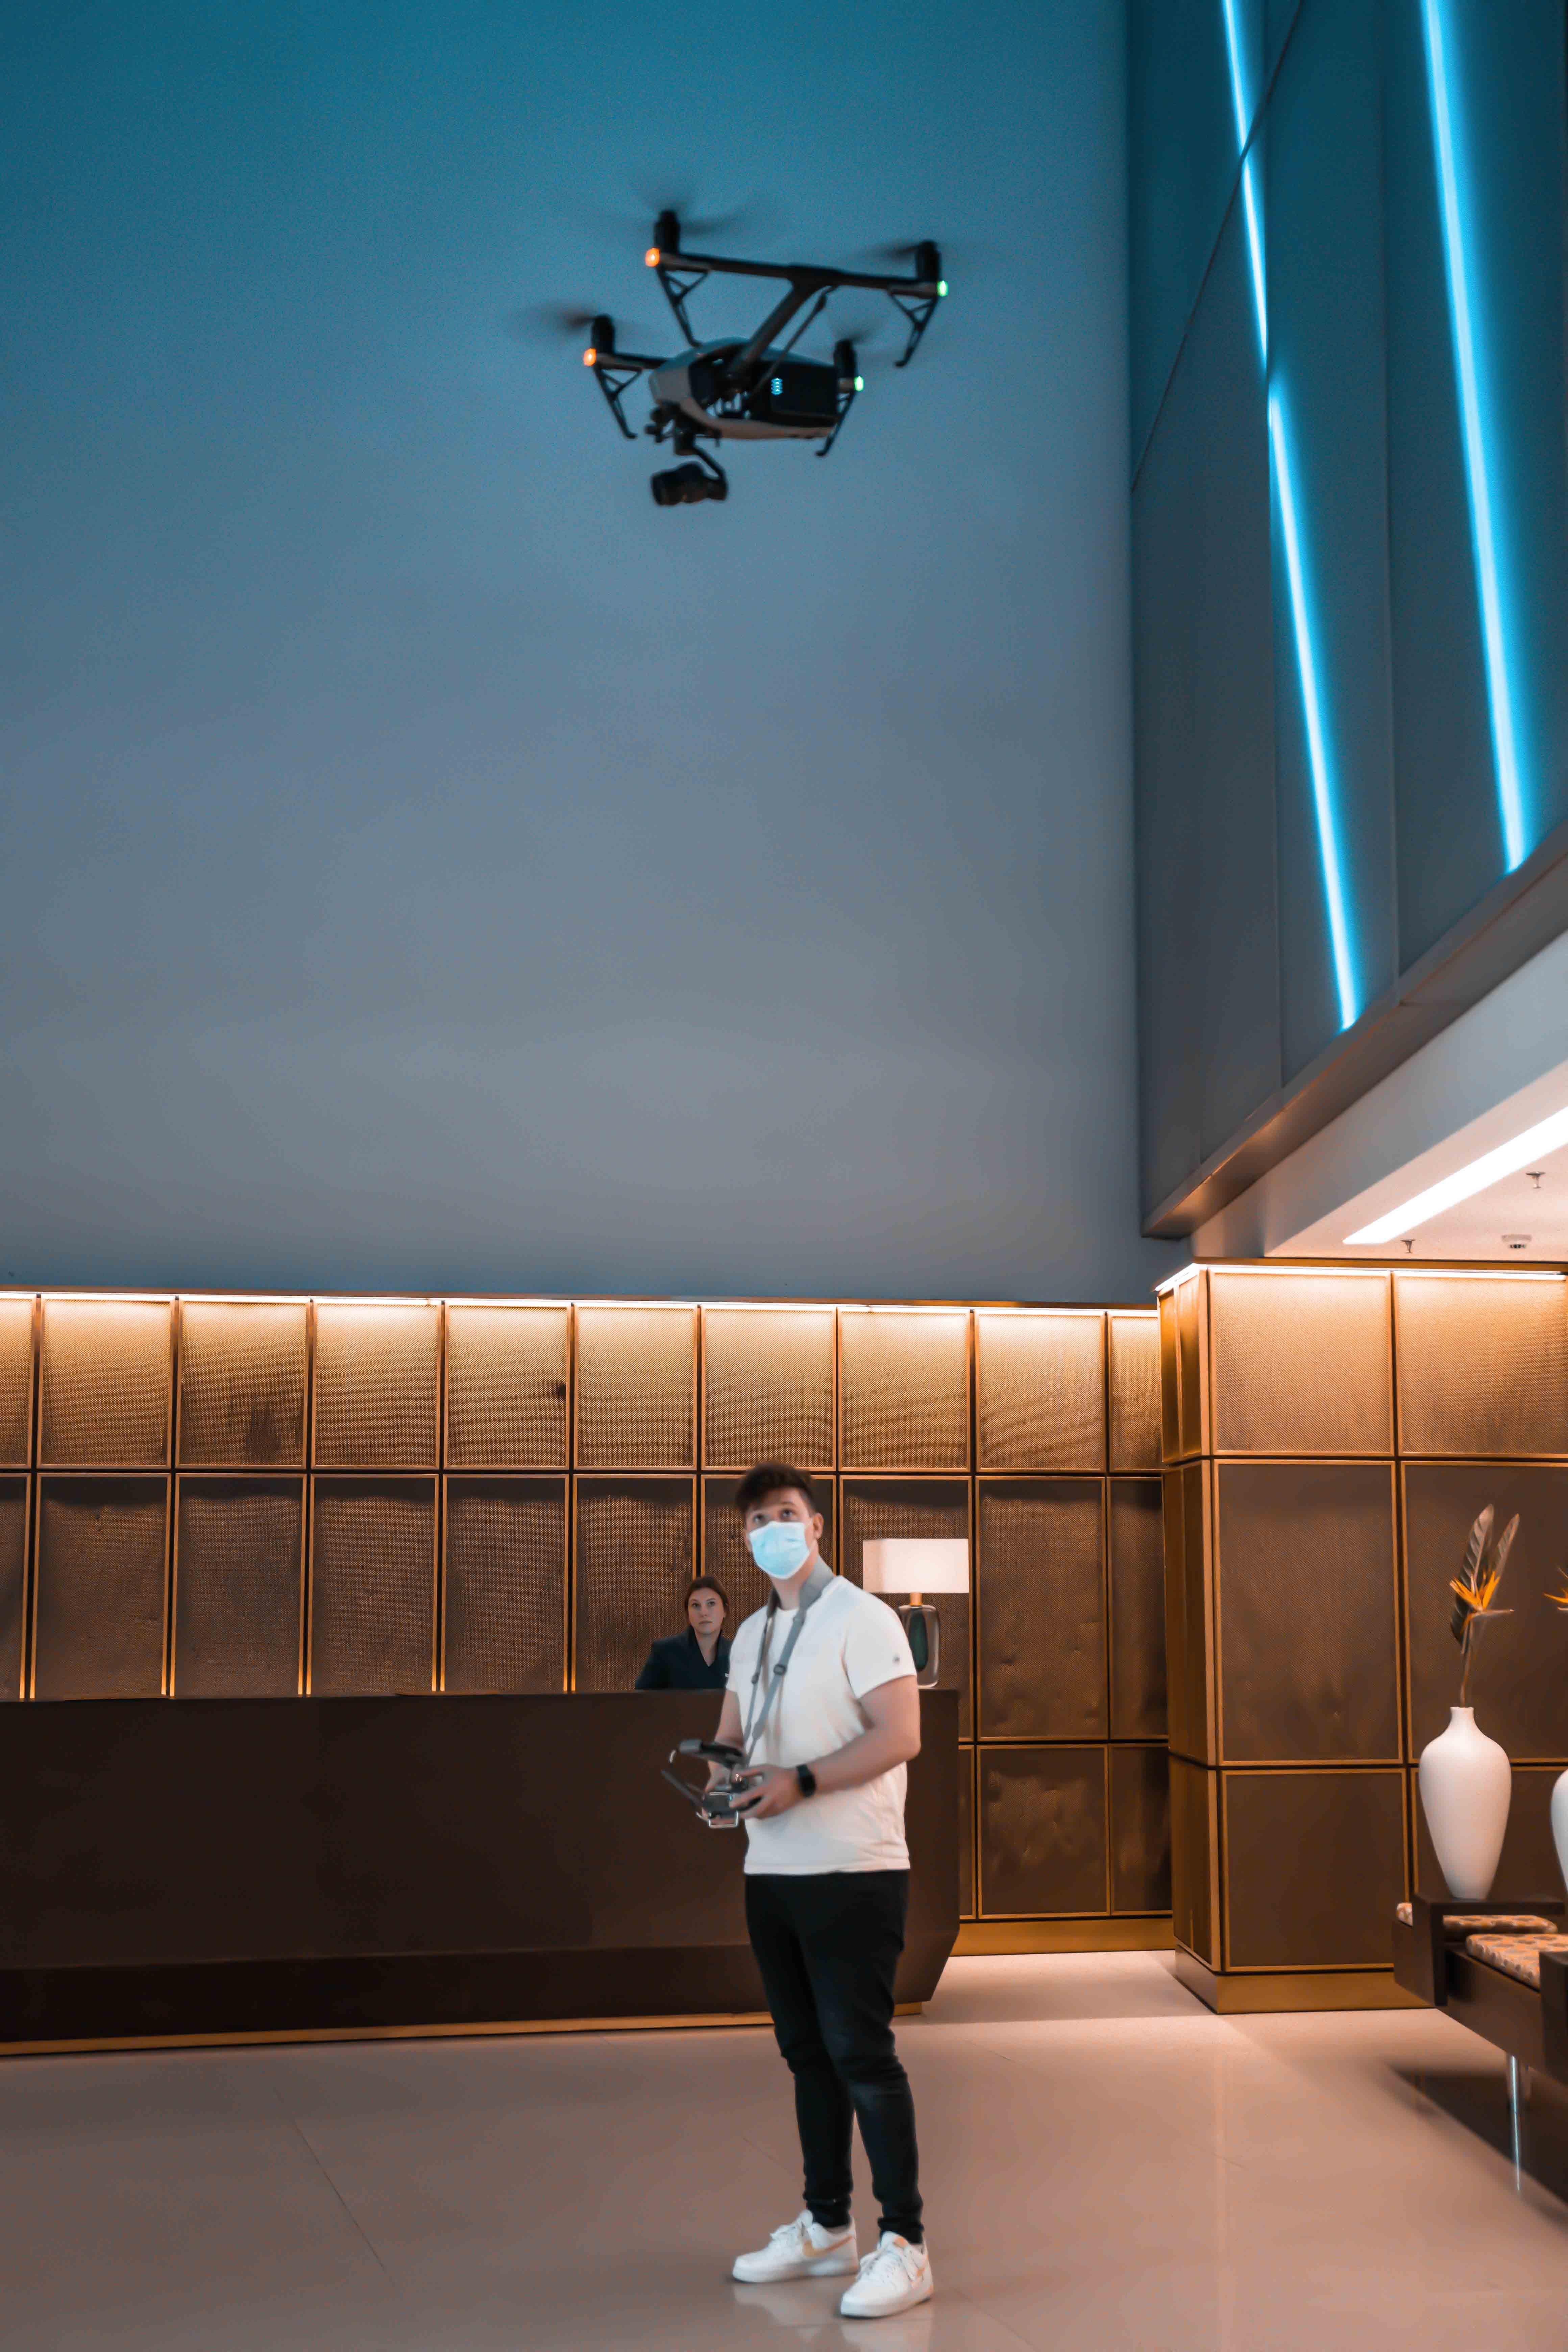 DJI Inspire Drohnenaufnahmen Hamburg Side Hotel